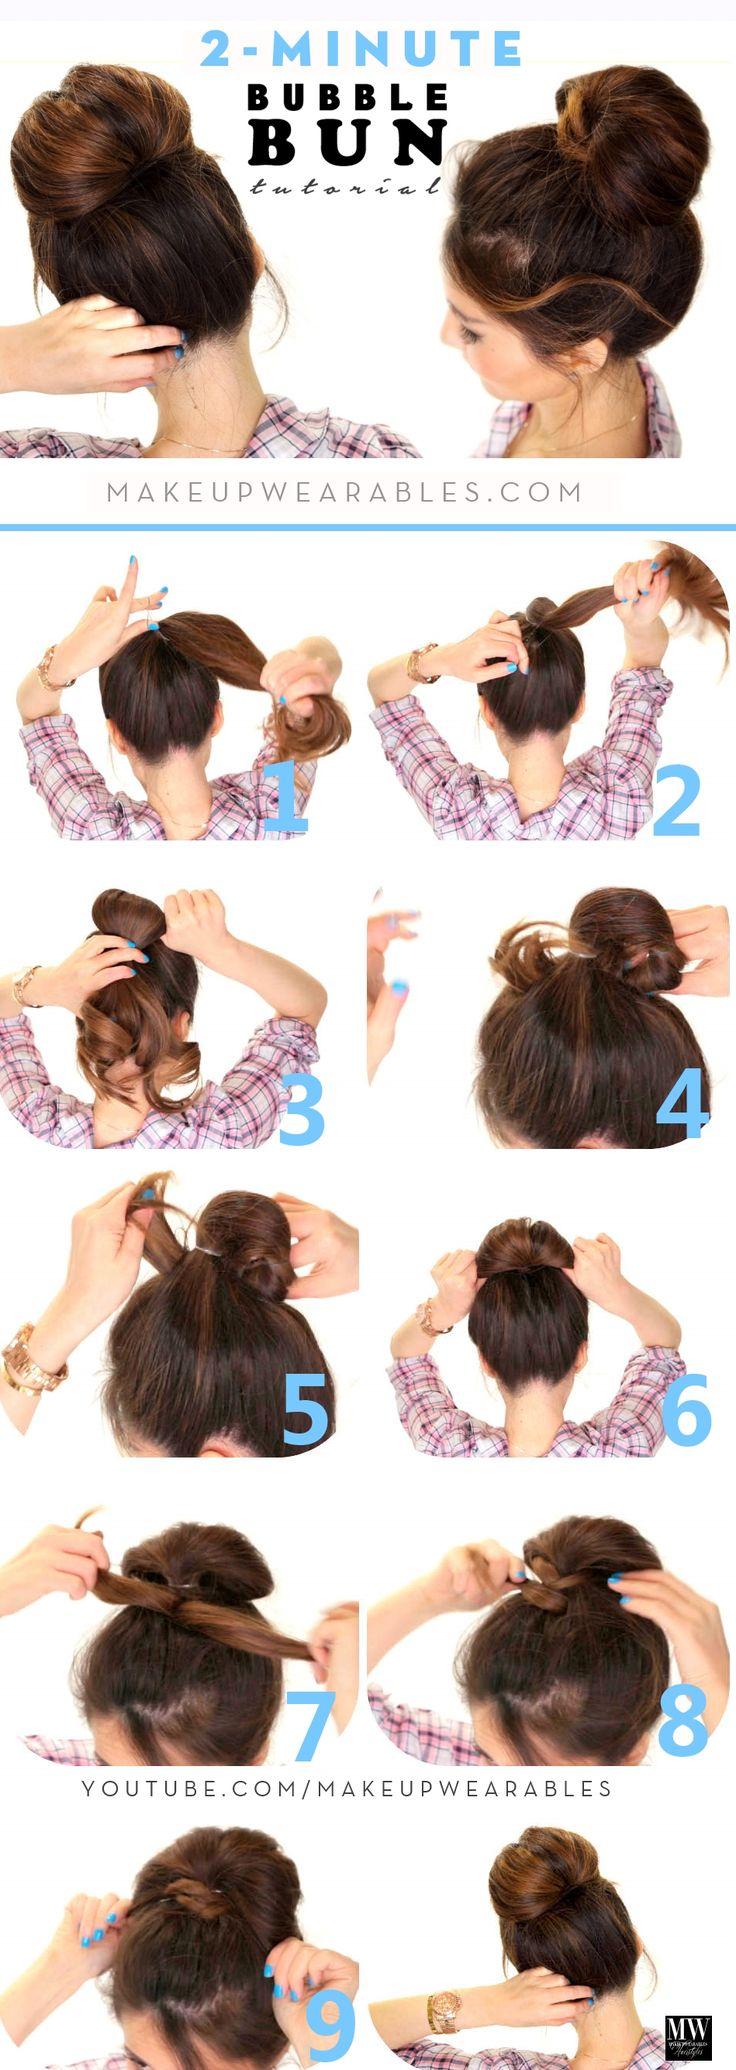 Easy bun hairstyles for long straight hair hairsstyles best 25 long hair buns ideas on perfect bun tutorial baditri Gallery